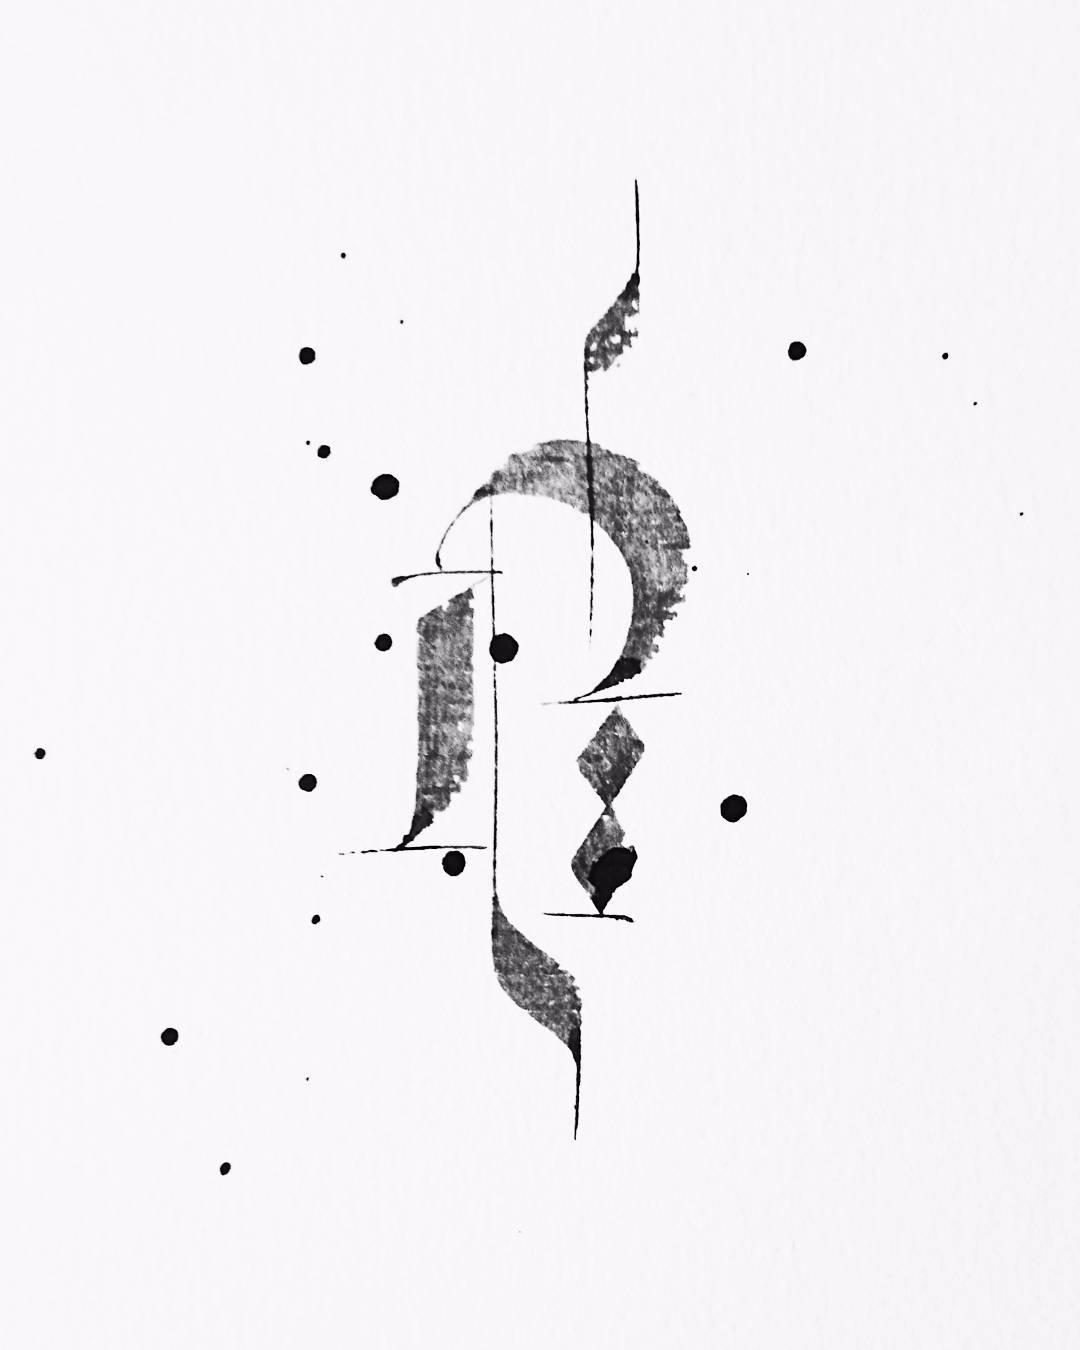 002 - Flunctuations - calligraphy - igorsturion | ello